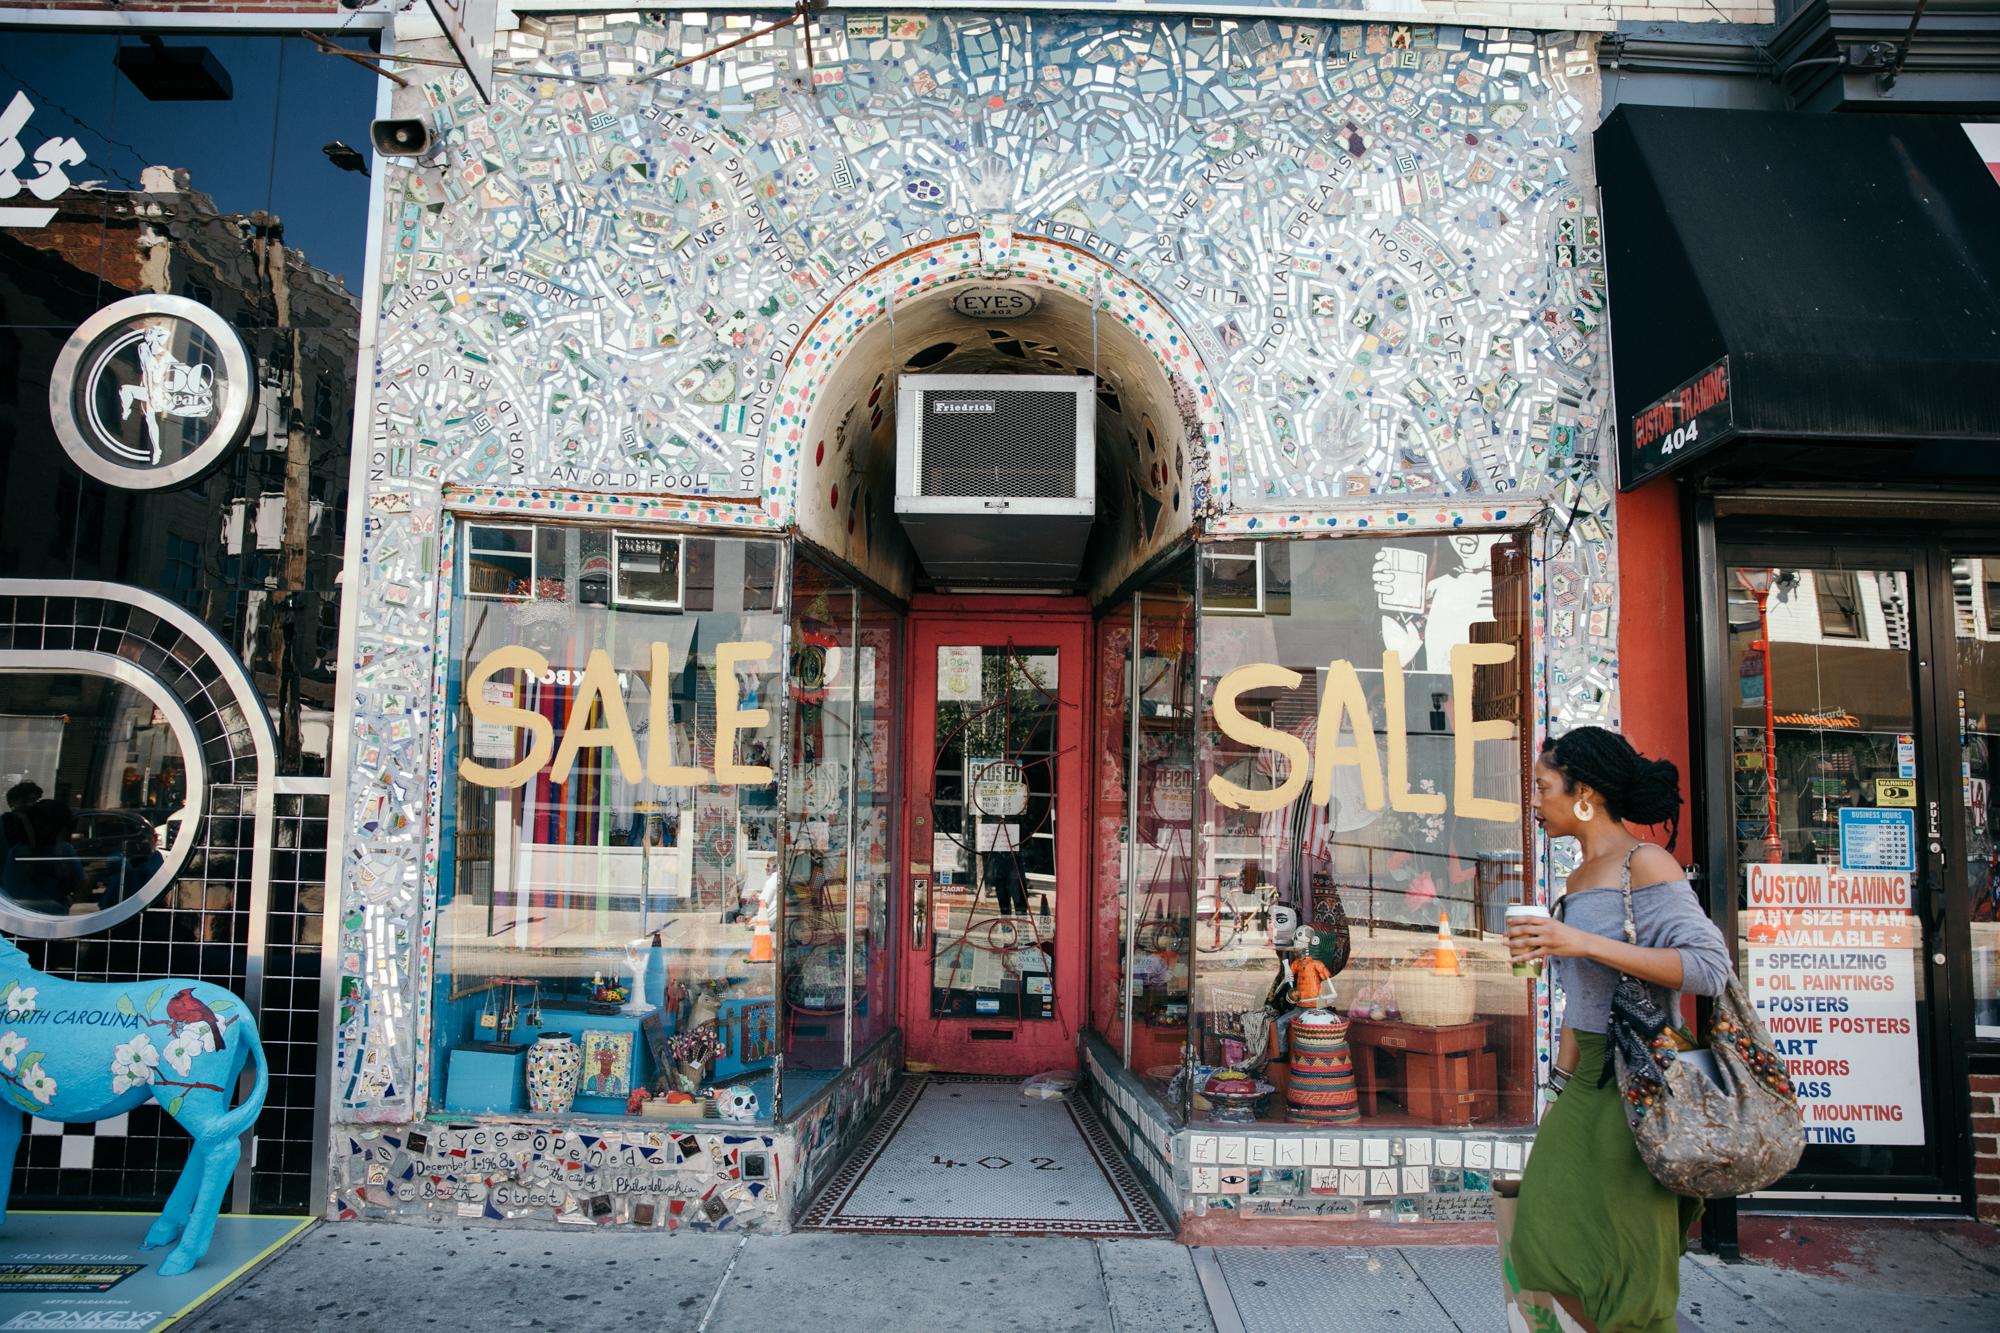 A woman walks by Eyes Gallery shop on South Street.